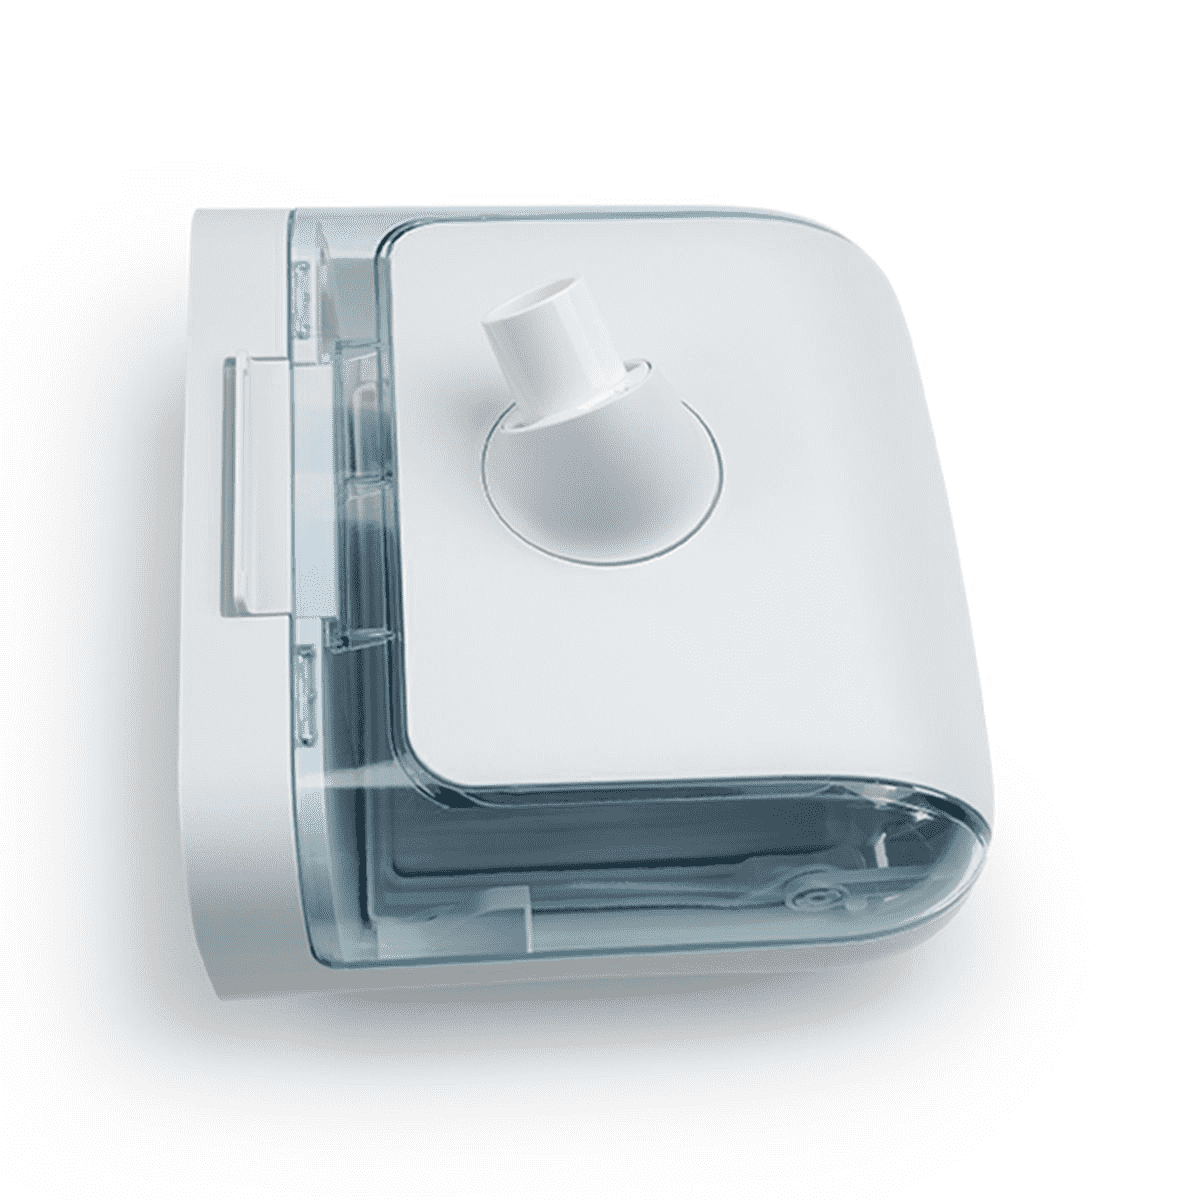 CPAP Dreamstation Auto Philips + Umidificador + Máscara Nasal DreamWear com almofadas P, M,G Philips